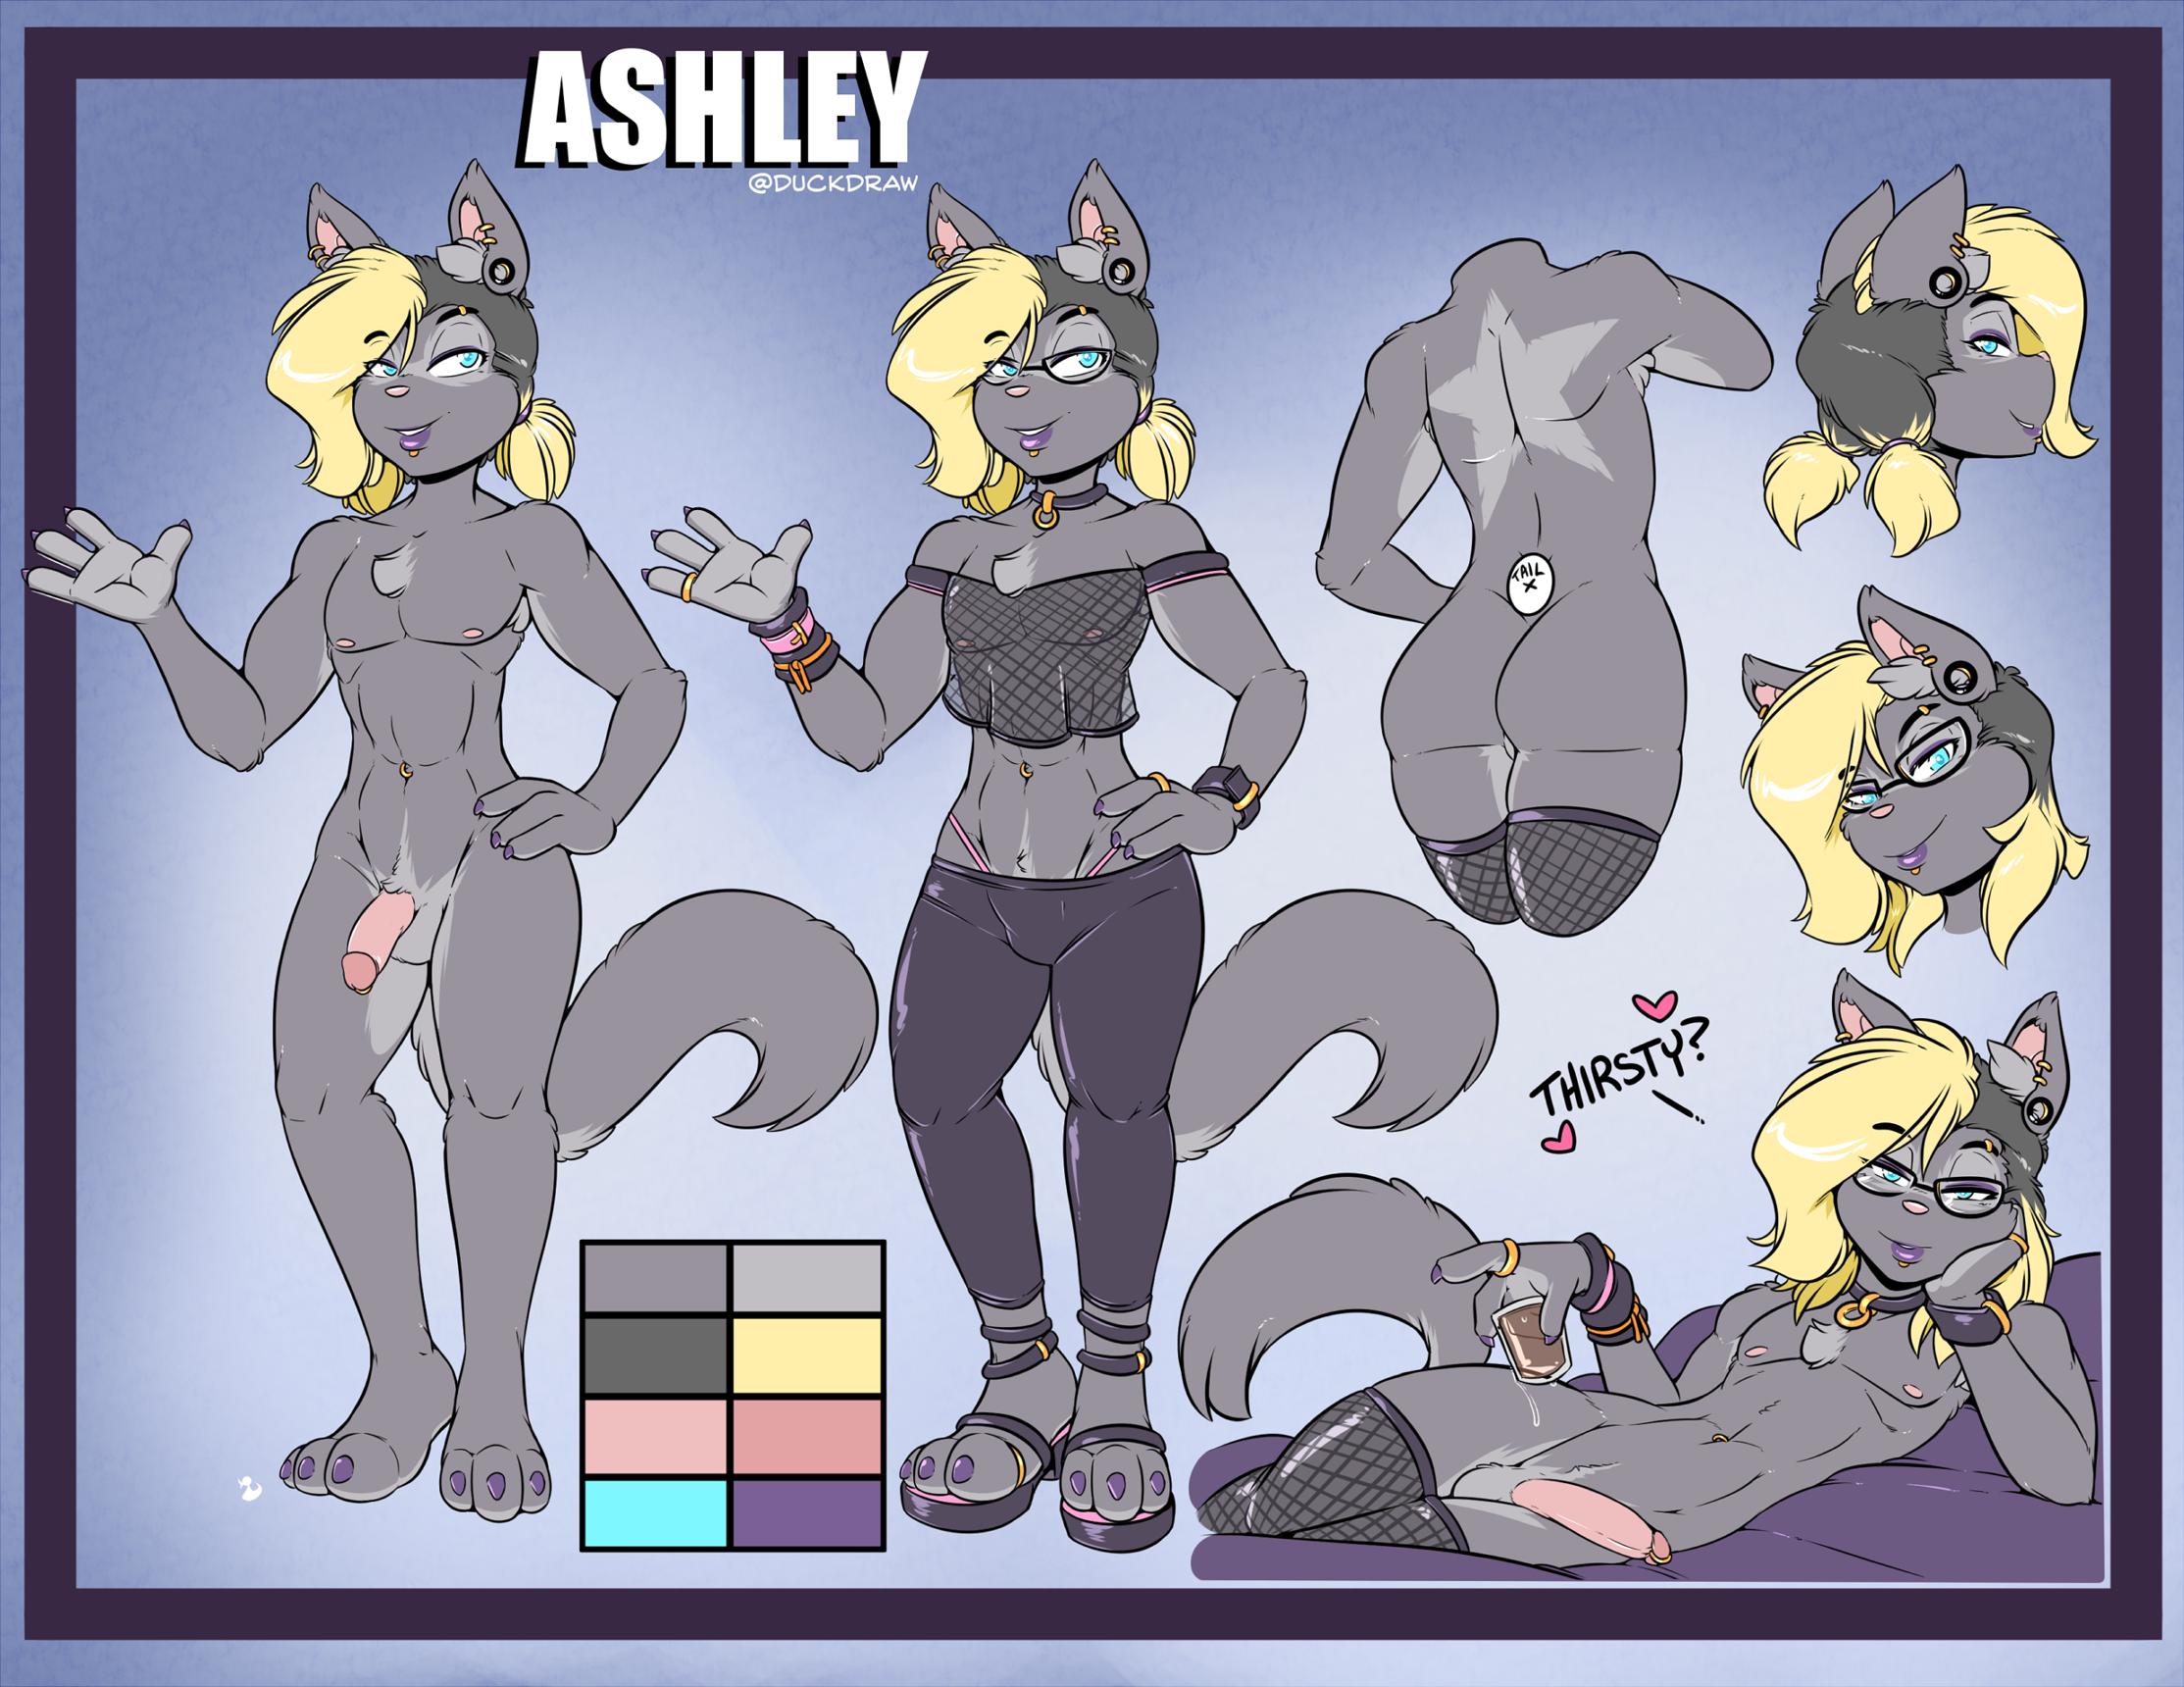 Reference - Ashley